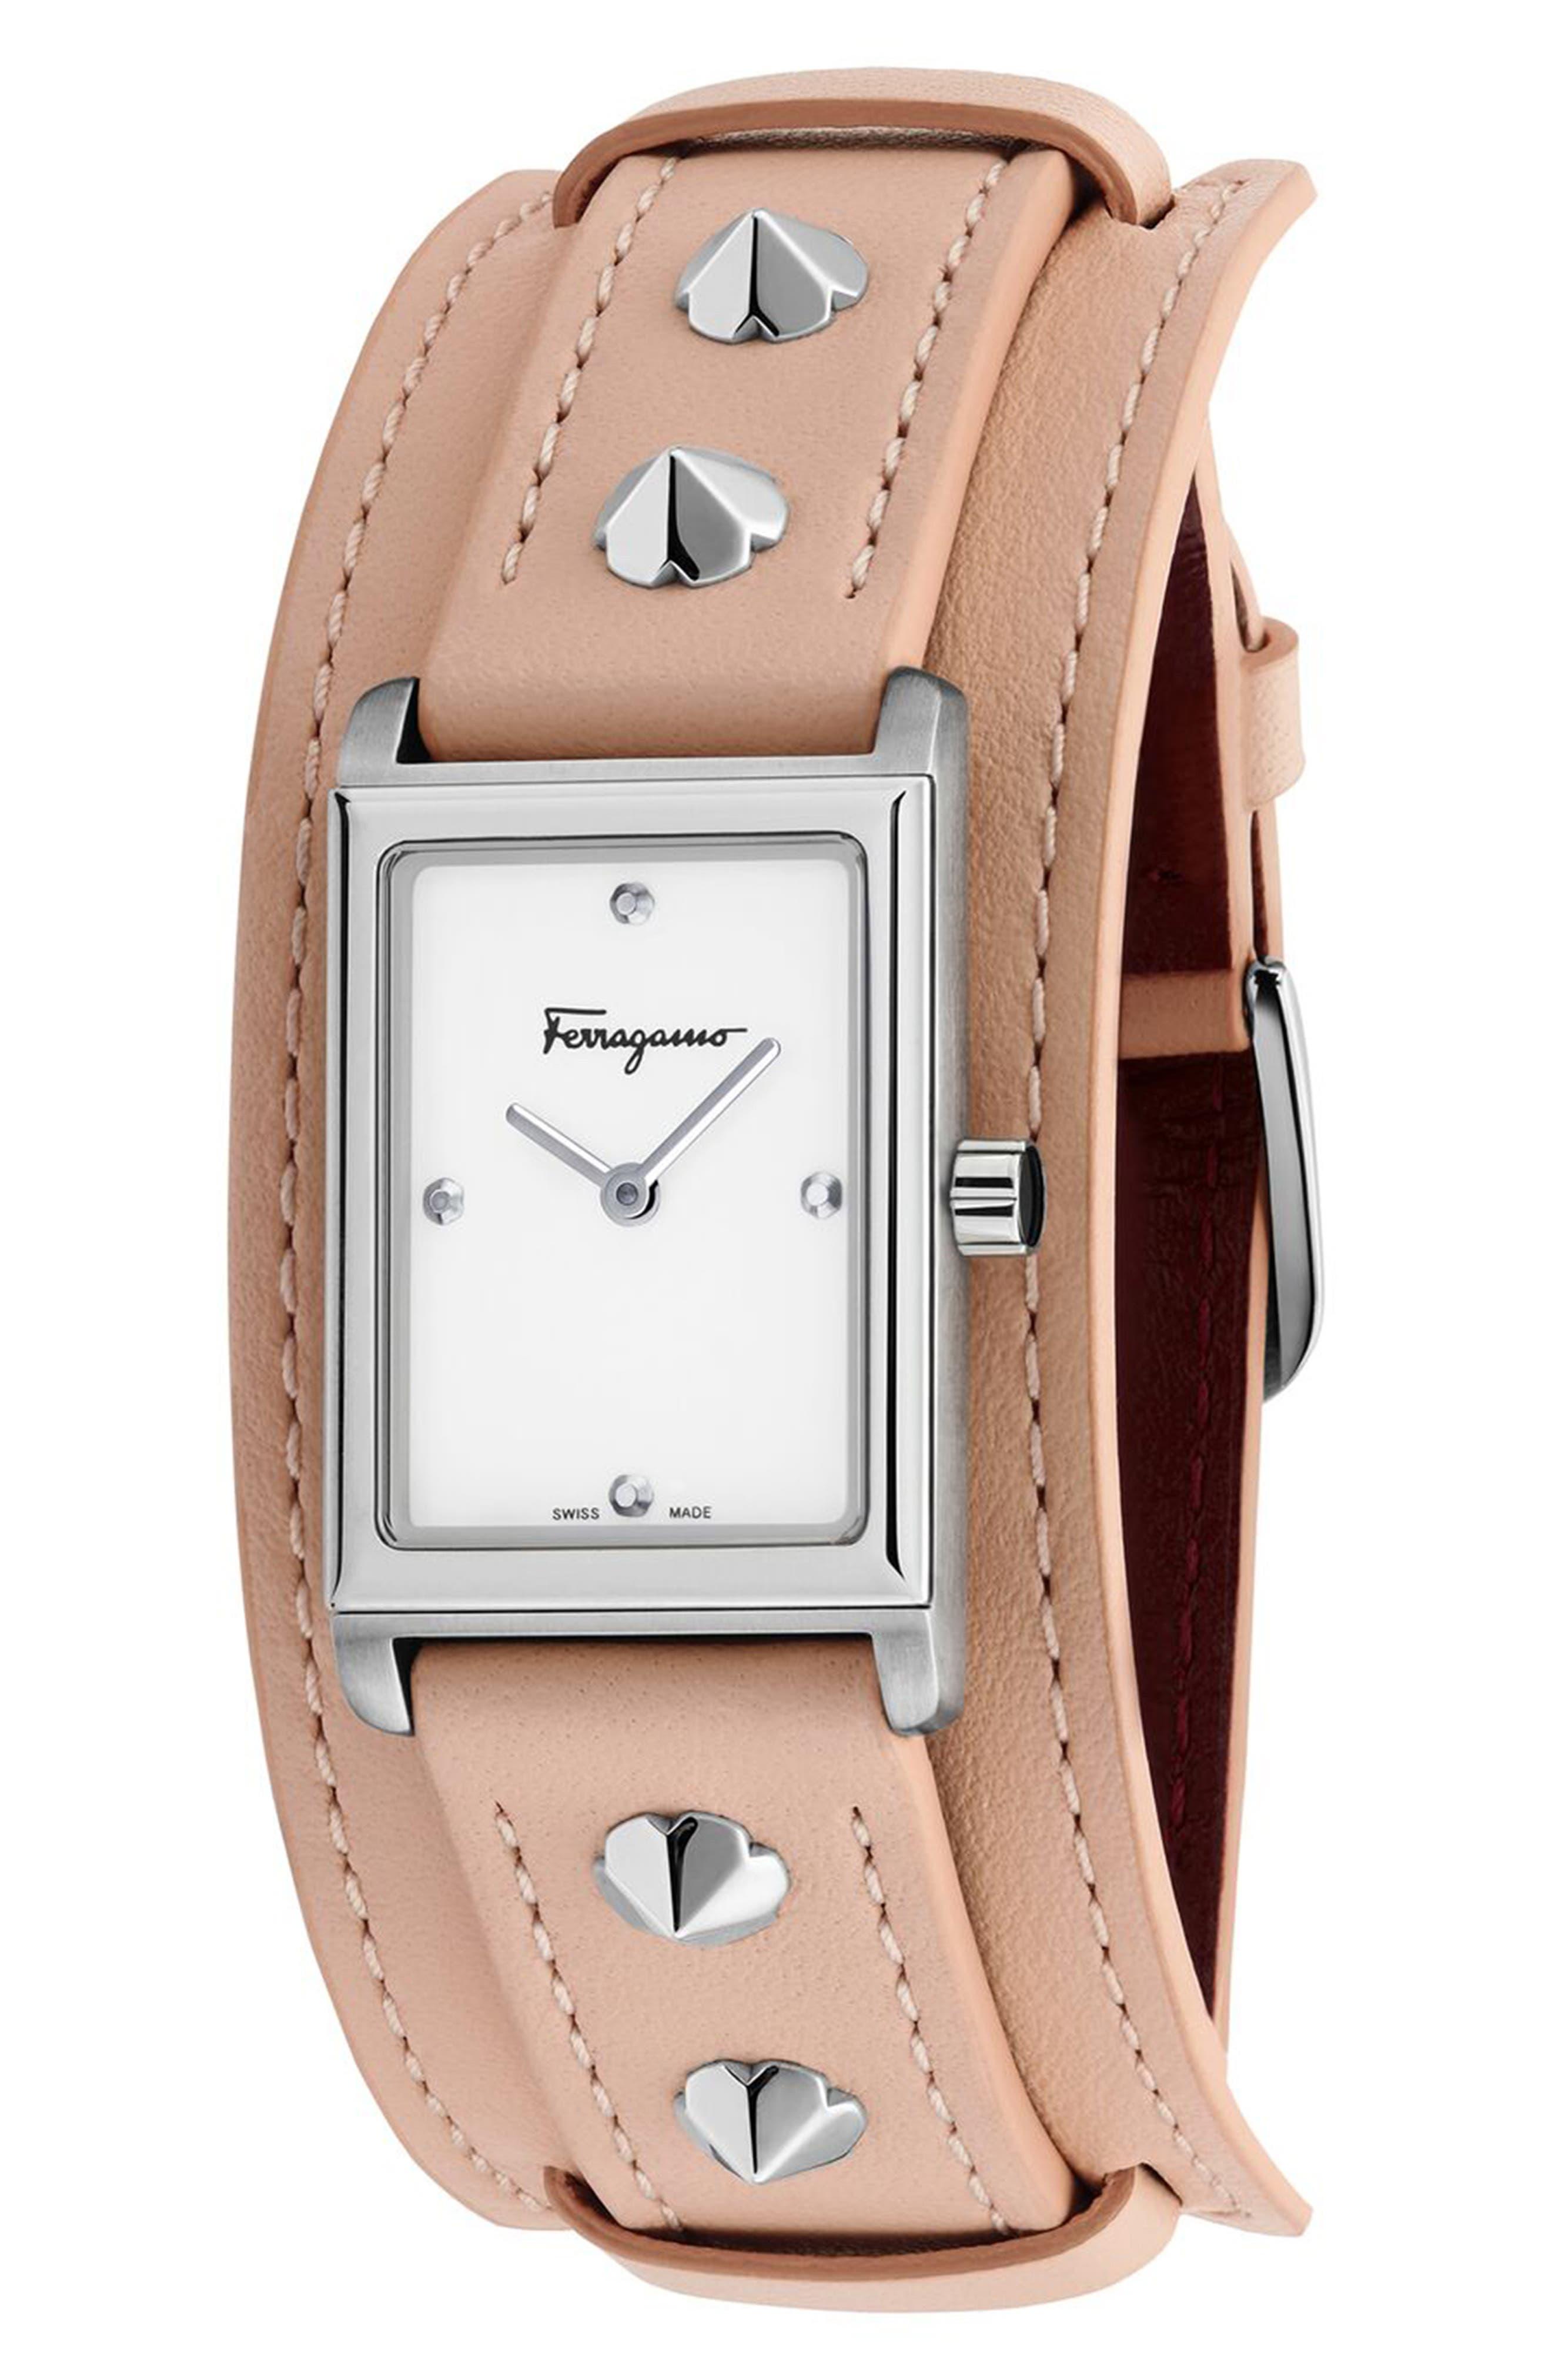 Image of Salvatore Ferragamo Fiore Studs Leather Strap Watch, 34mm